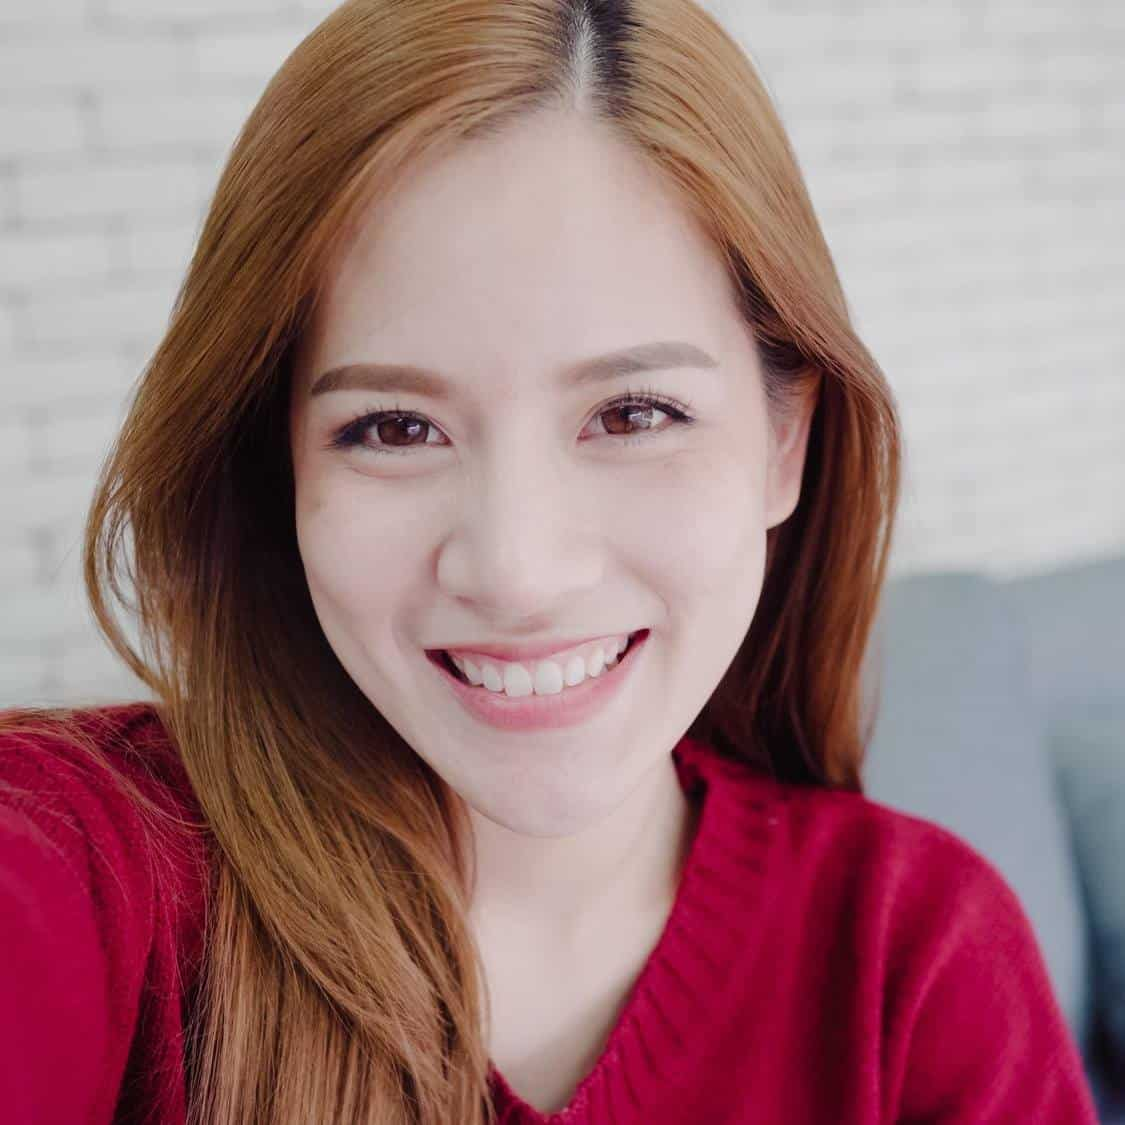 Nguyễn Thu Hiền Founder Saosanhthoi.com